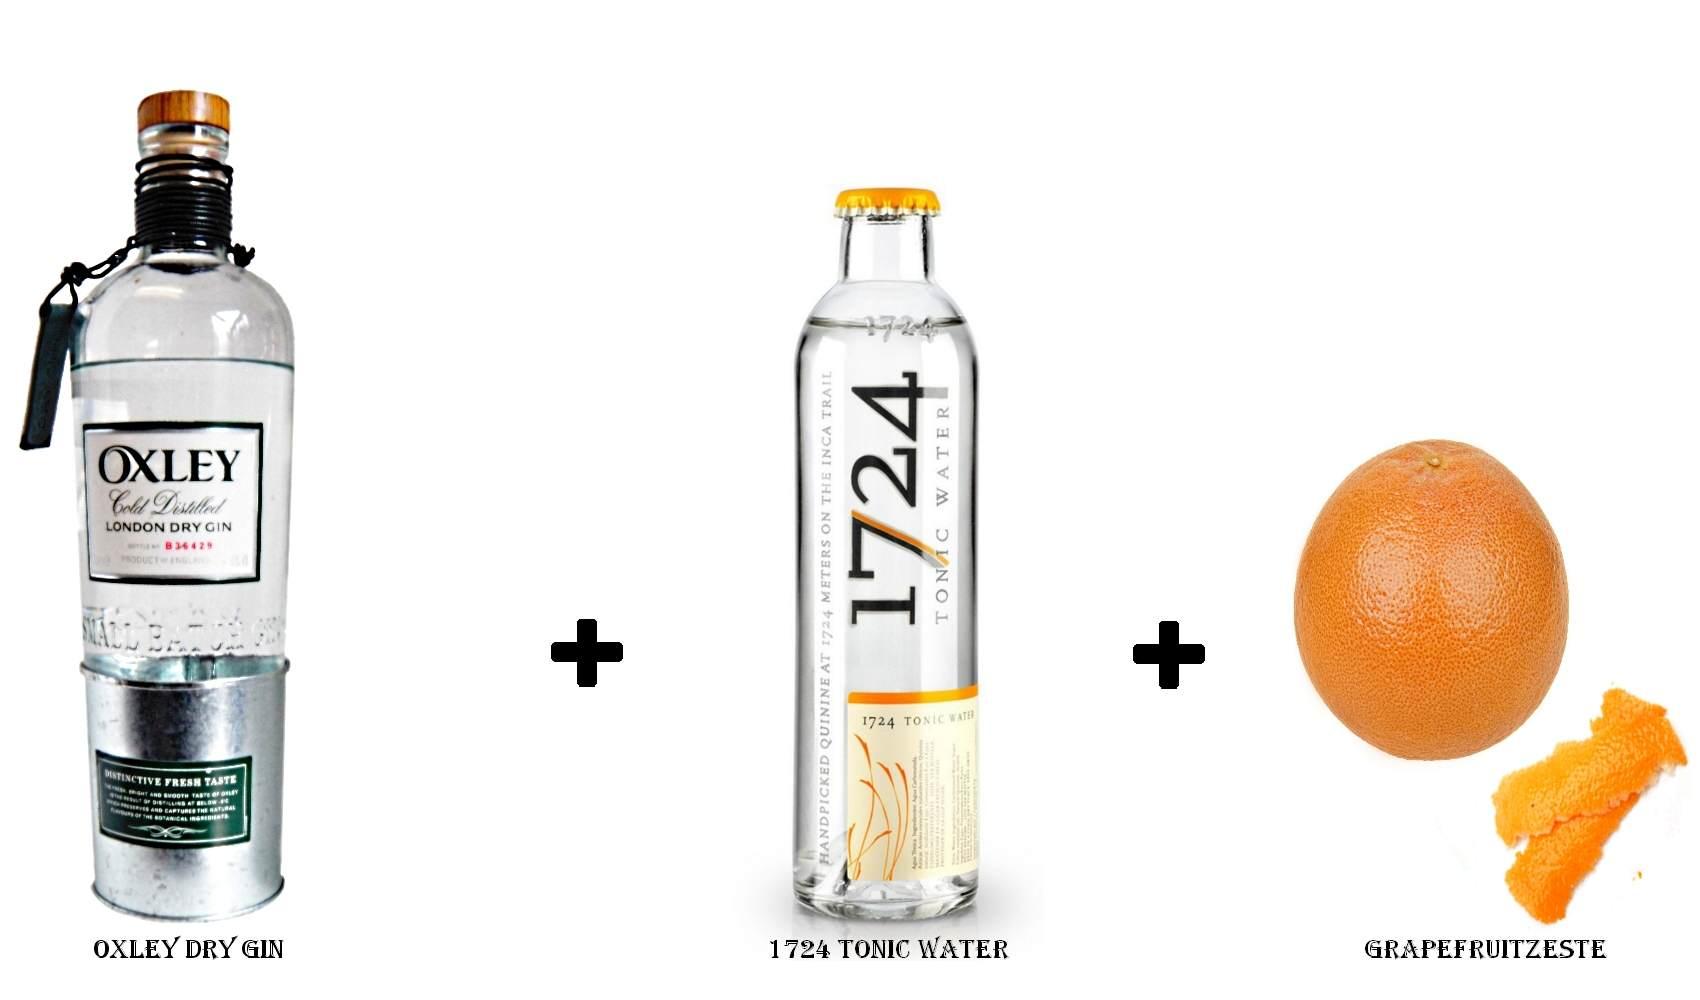 Oxley Dry Gin + 1724 Tonic Water + Grapefruitzeste